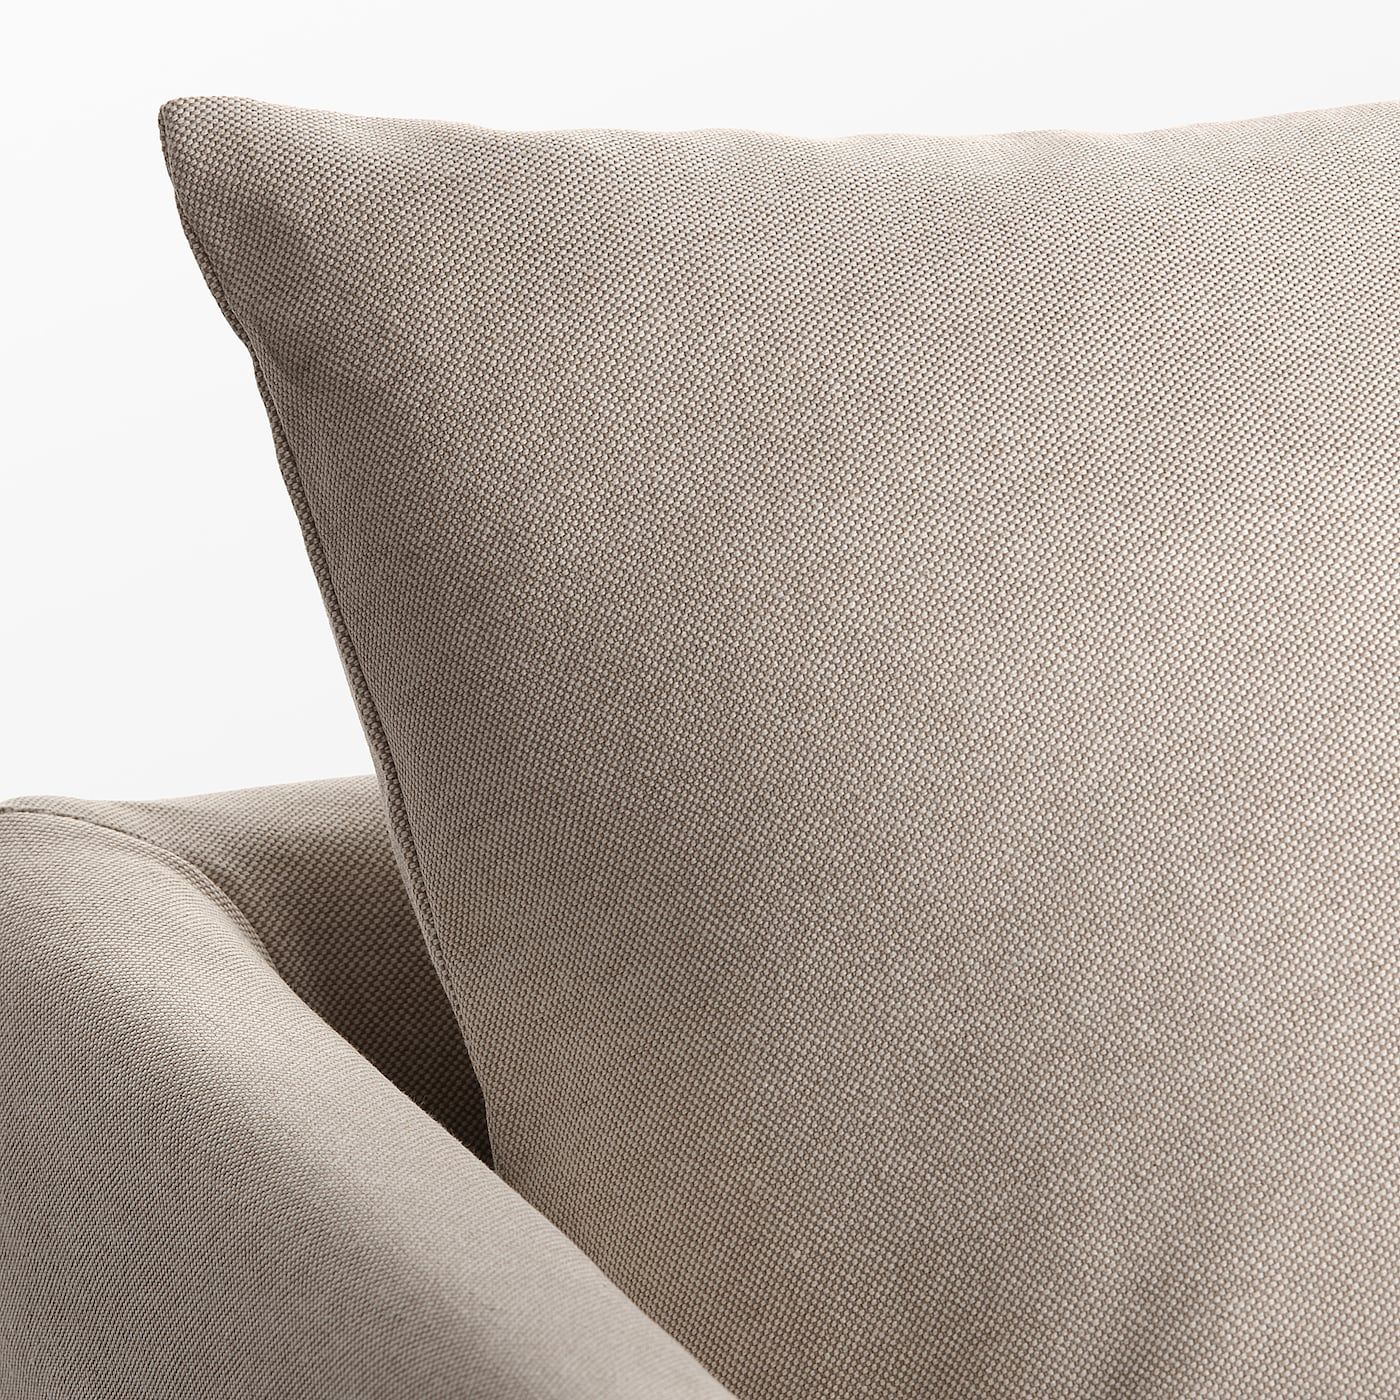 Sandbacken 3er Sofa Lofallet Beige Ikea Osterreich In 2020 Sleeper Sectional Corner Sofa Bed Beige Sofa